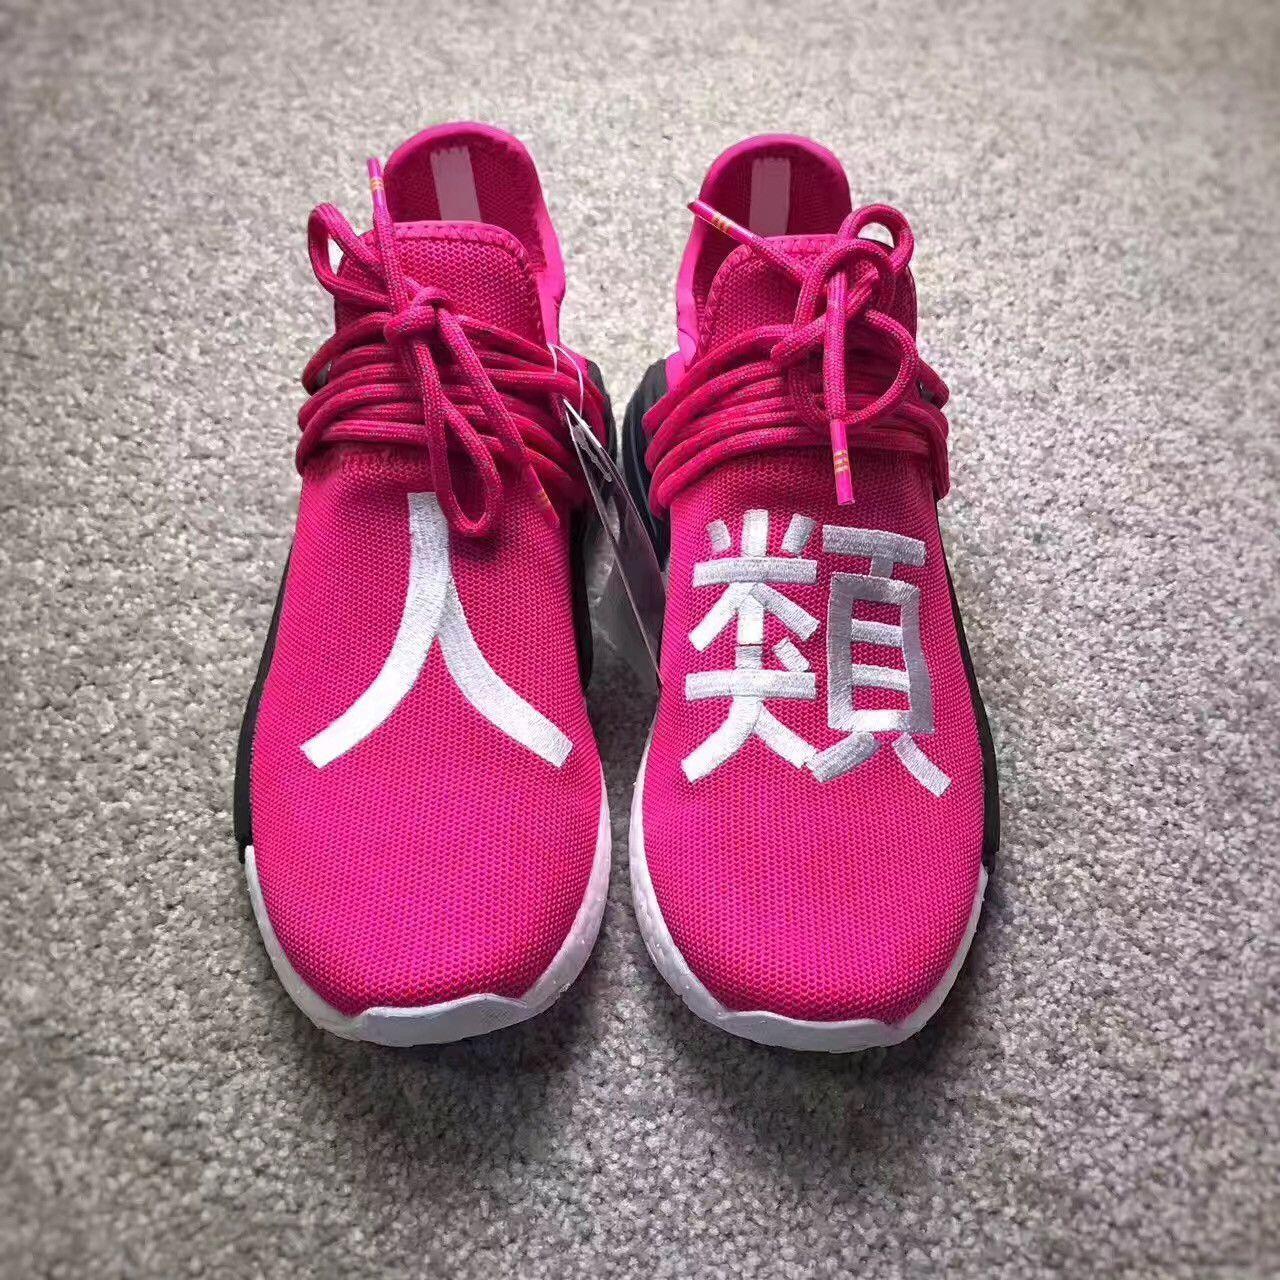 Adidas NMD Human Race X Pharrell Shock Pink   Adidas nmd